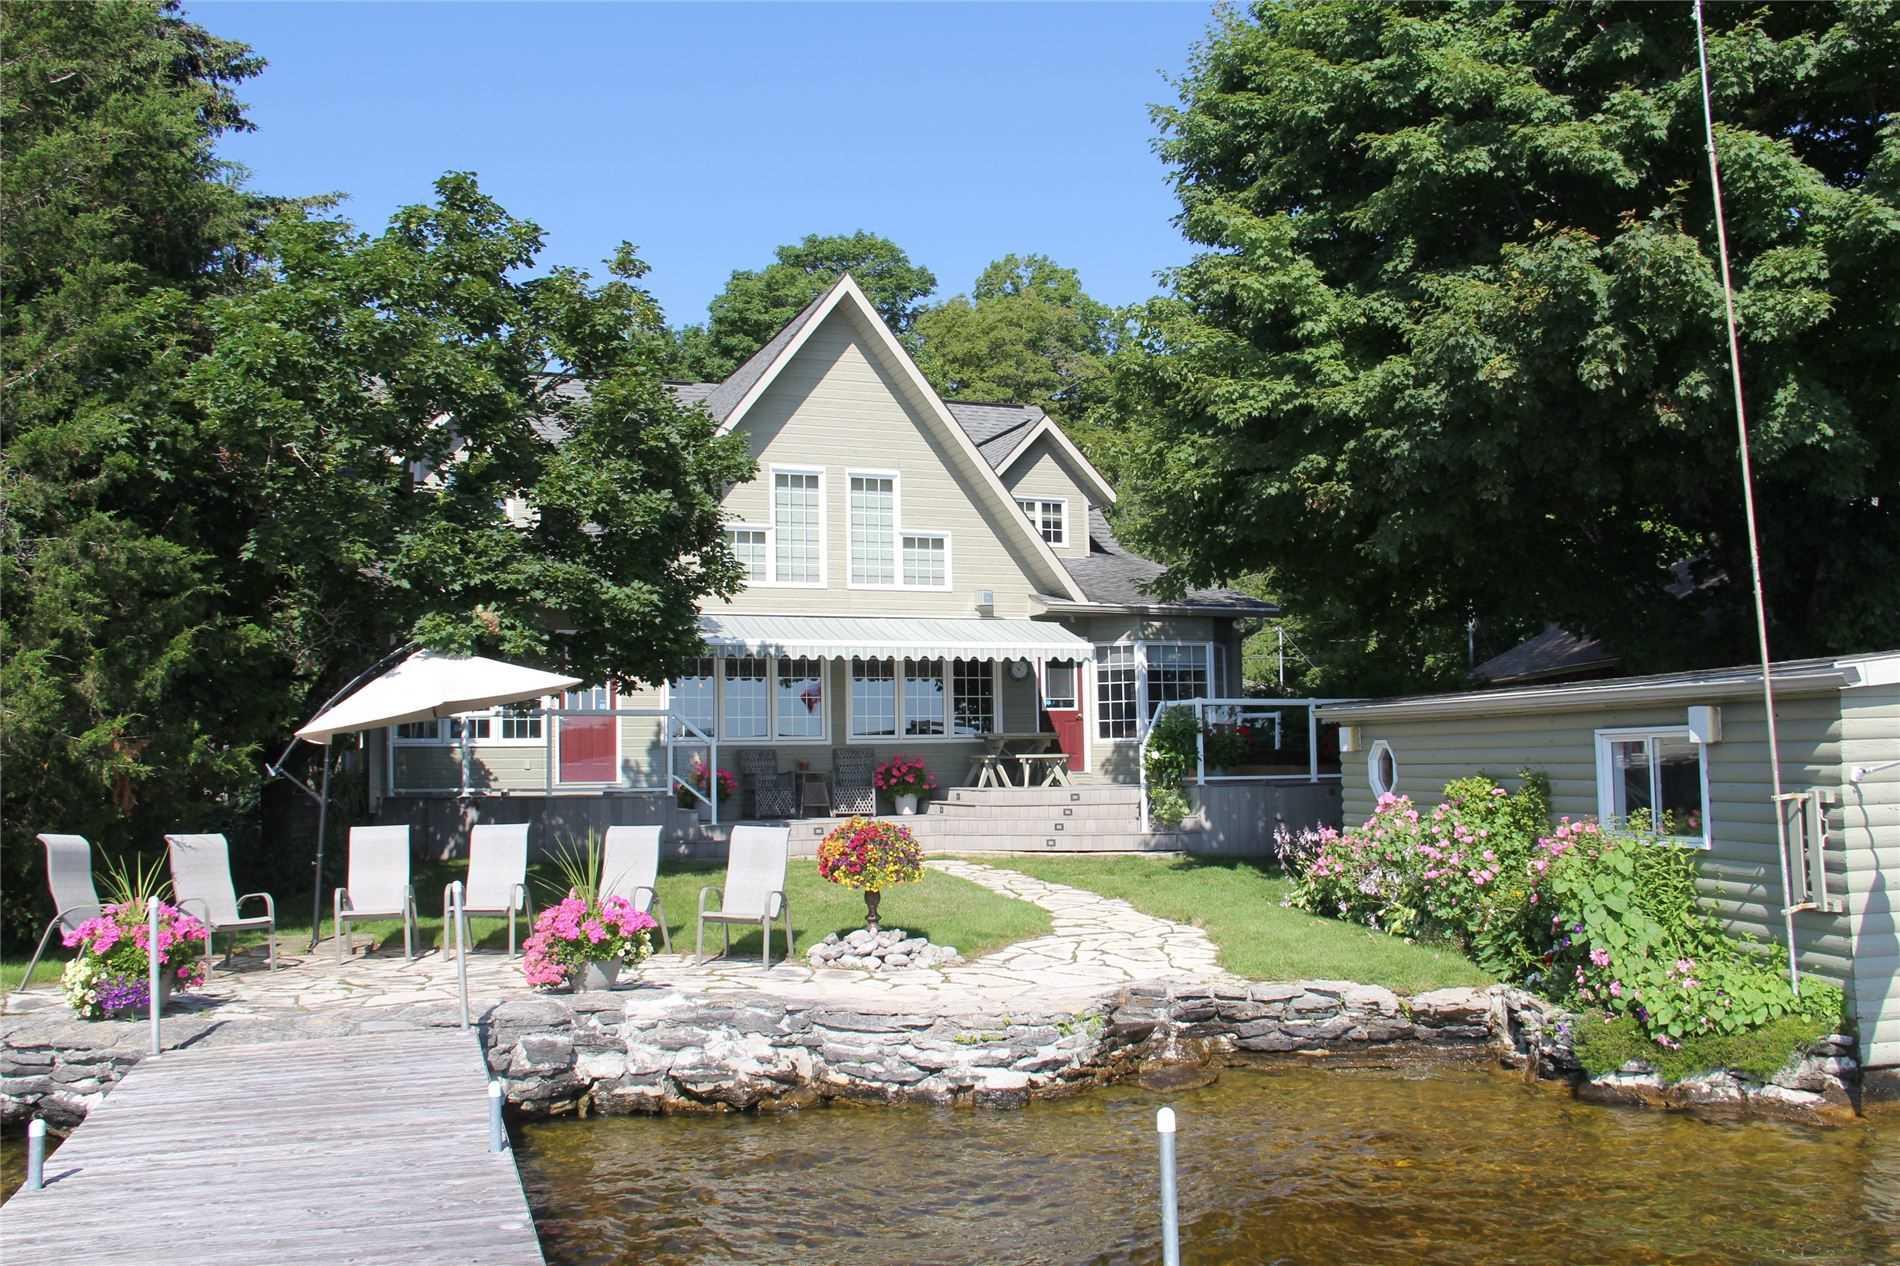 Detached house For Sale In Kawartha Lakes - 62 Homewood Park Rd, Kawartha Lakes, Ontario, Canada K0M 2B0 , 3 Bedrooms Bedrooms, ,3 BathroomsBathrooms,Detached,For Sale,Homewood Park